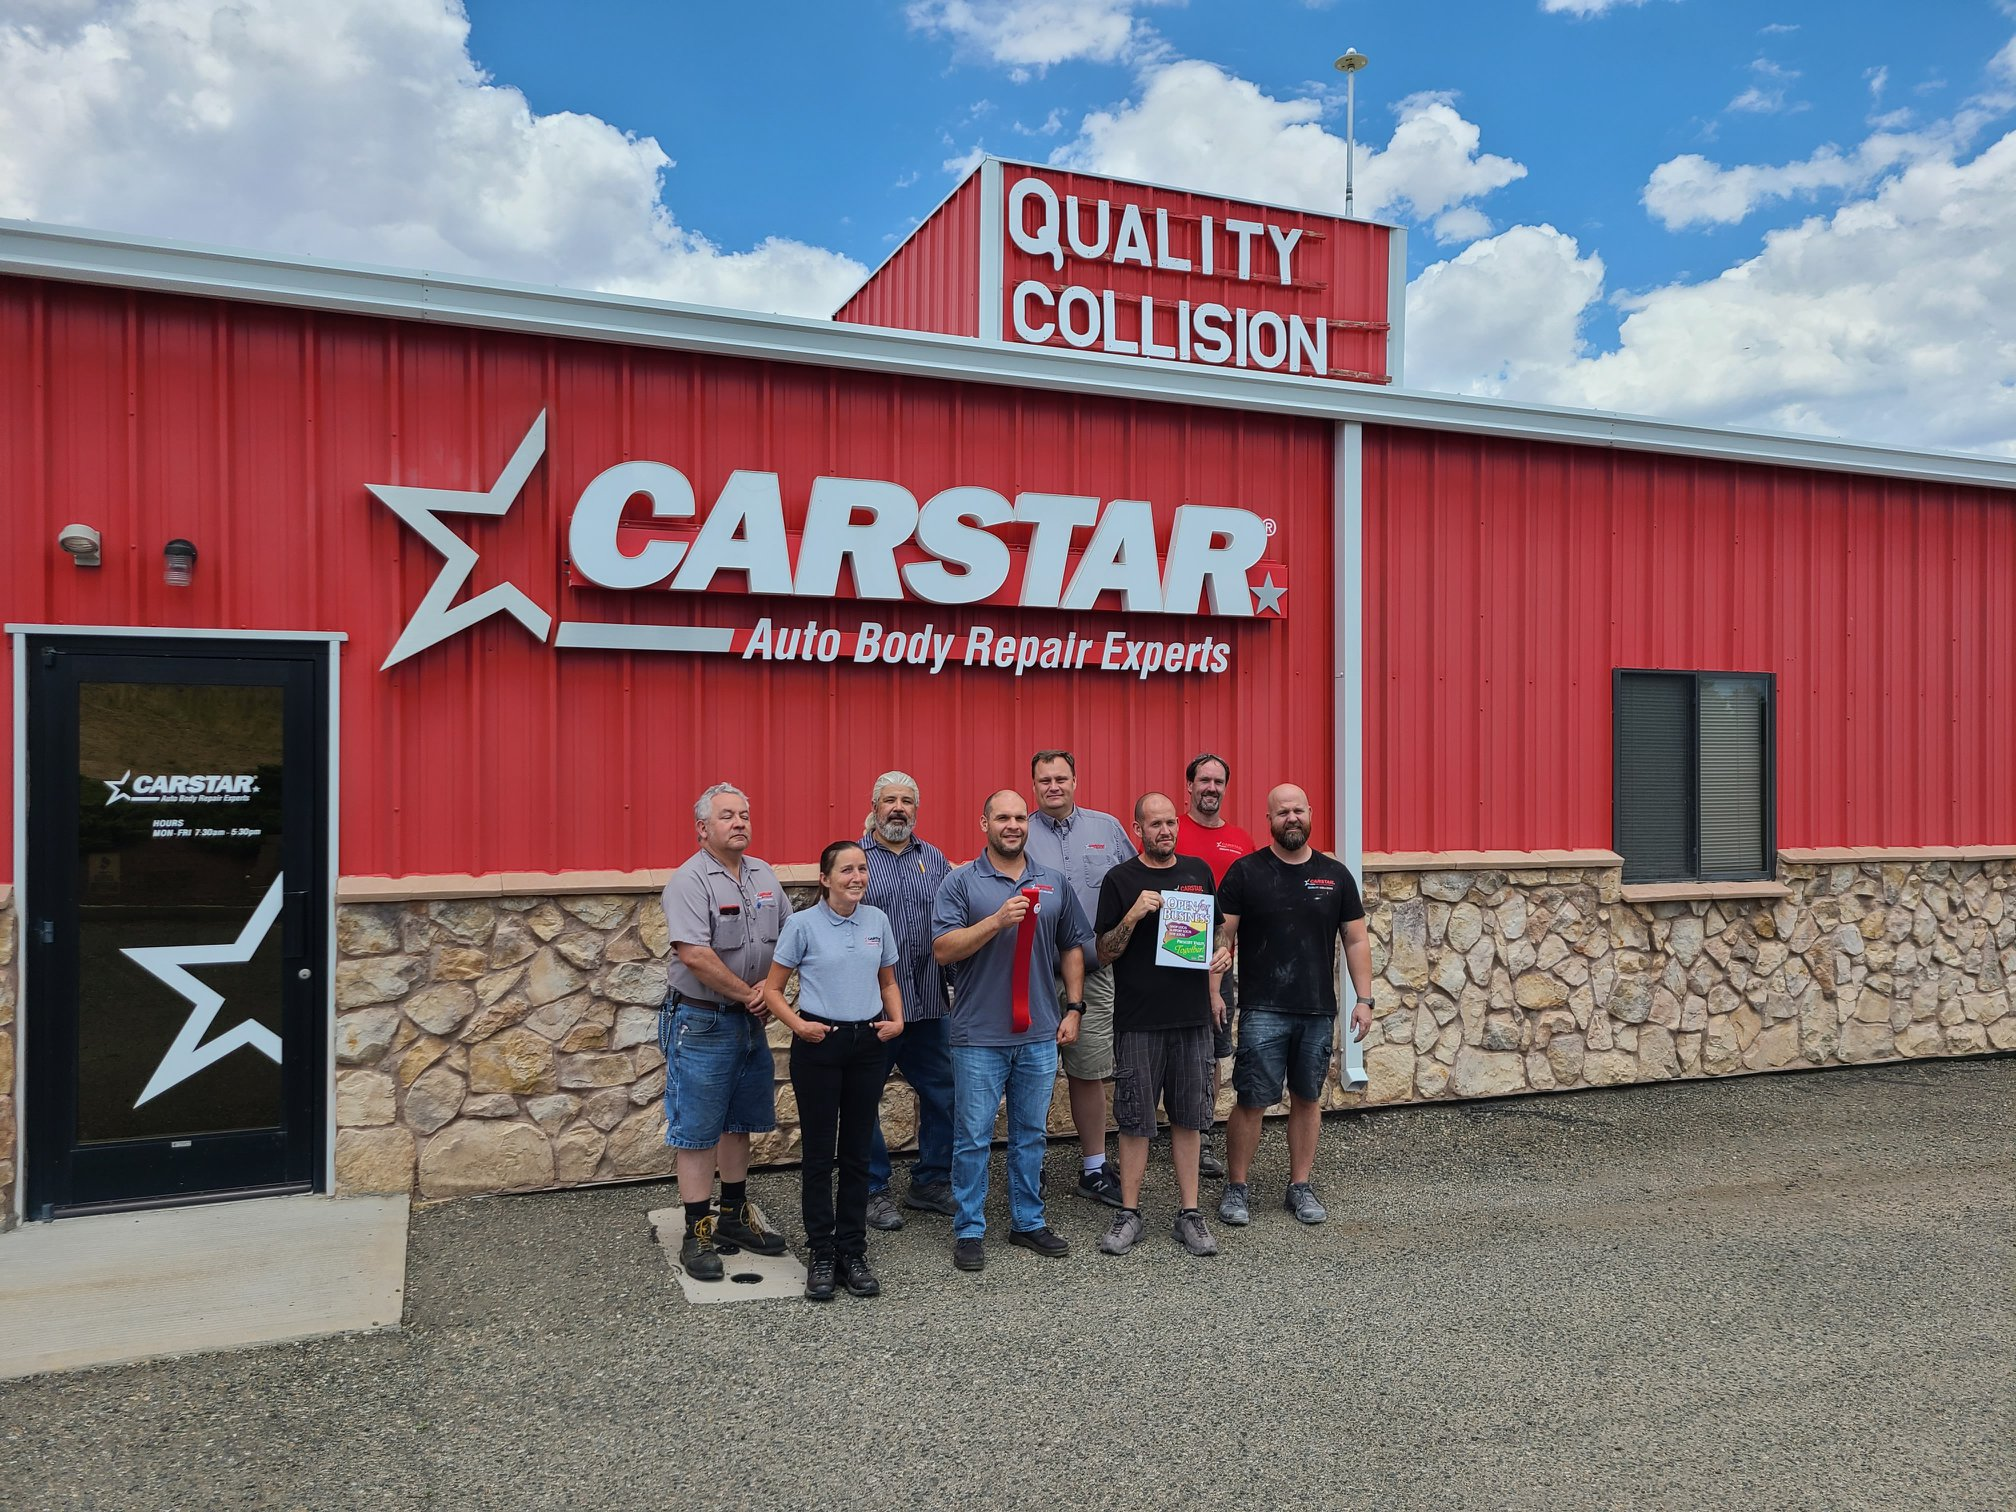 carstar-quality-collision.jpg